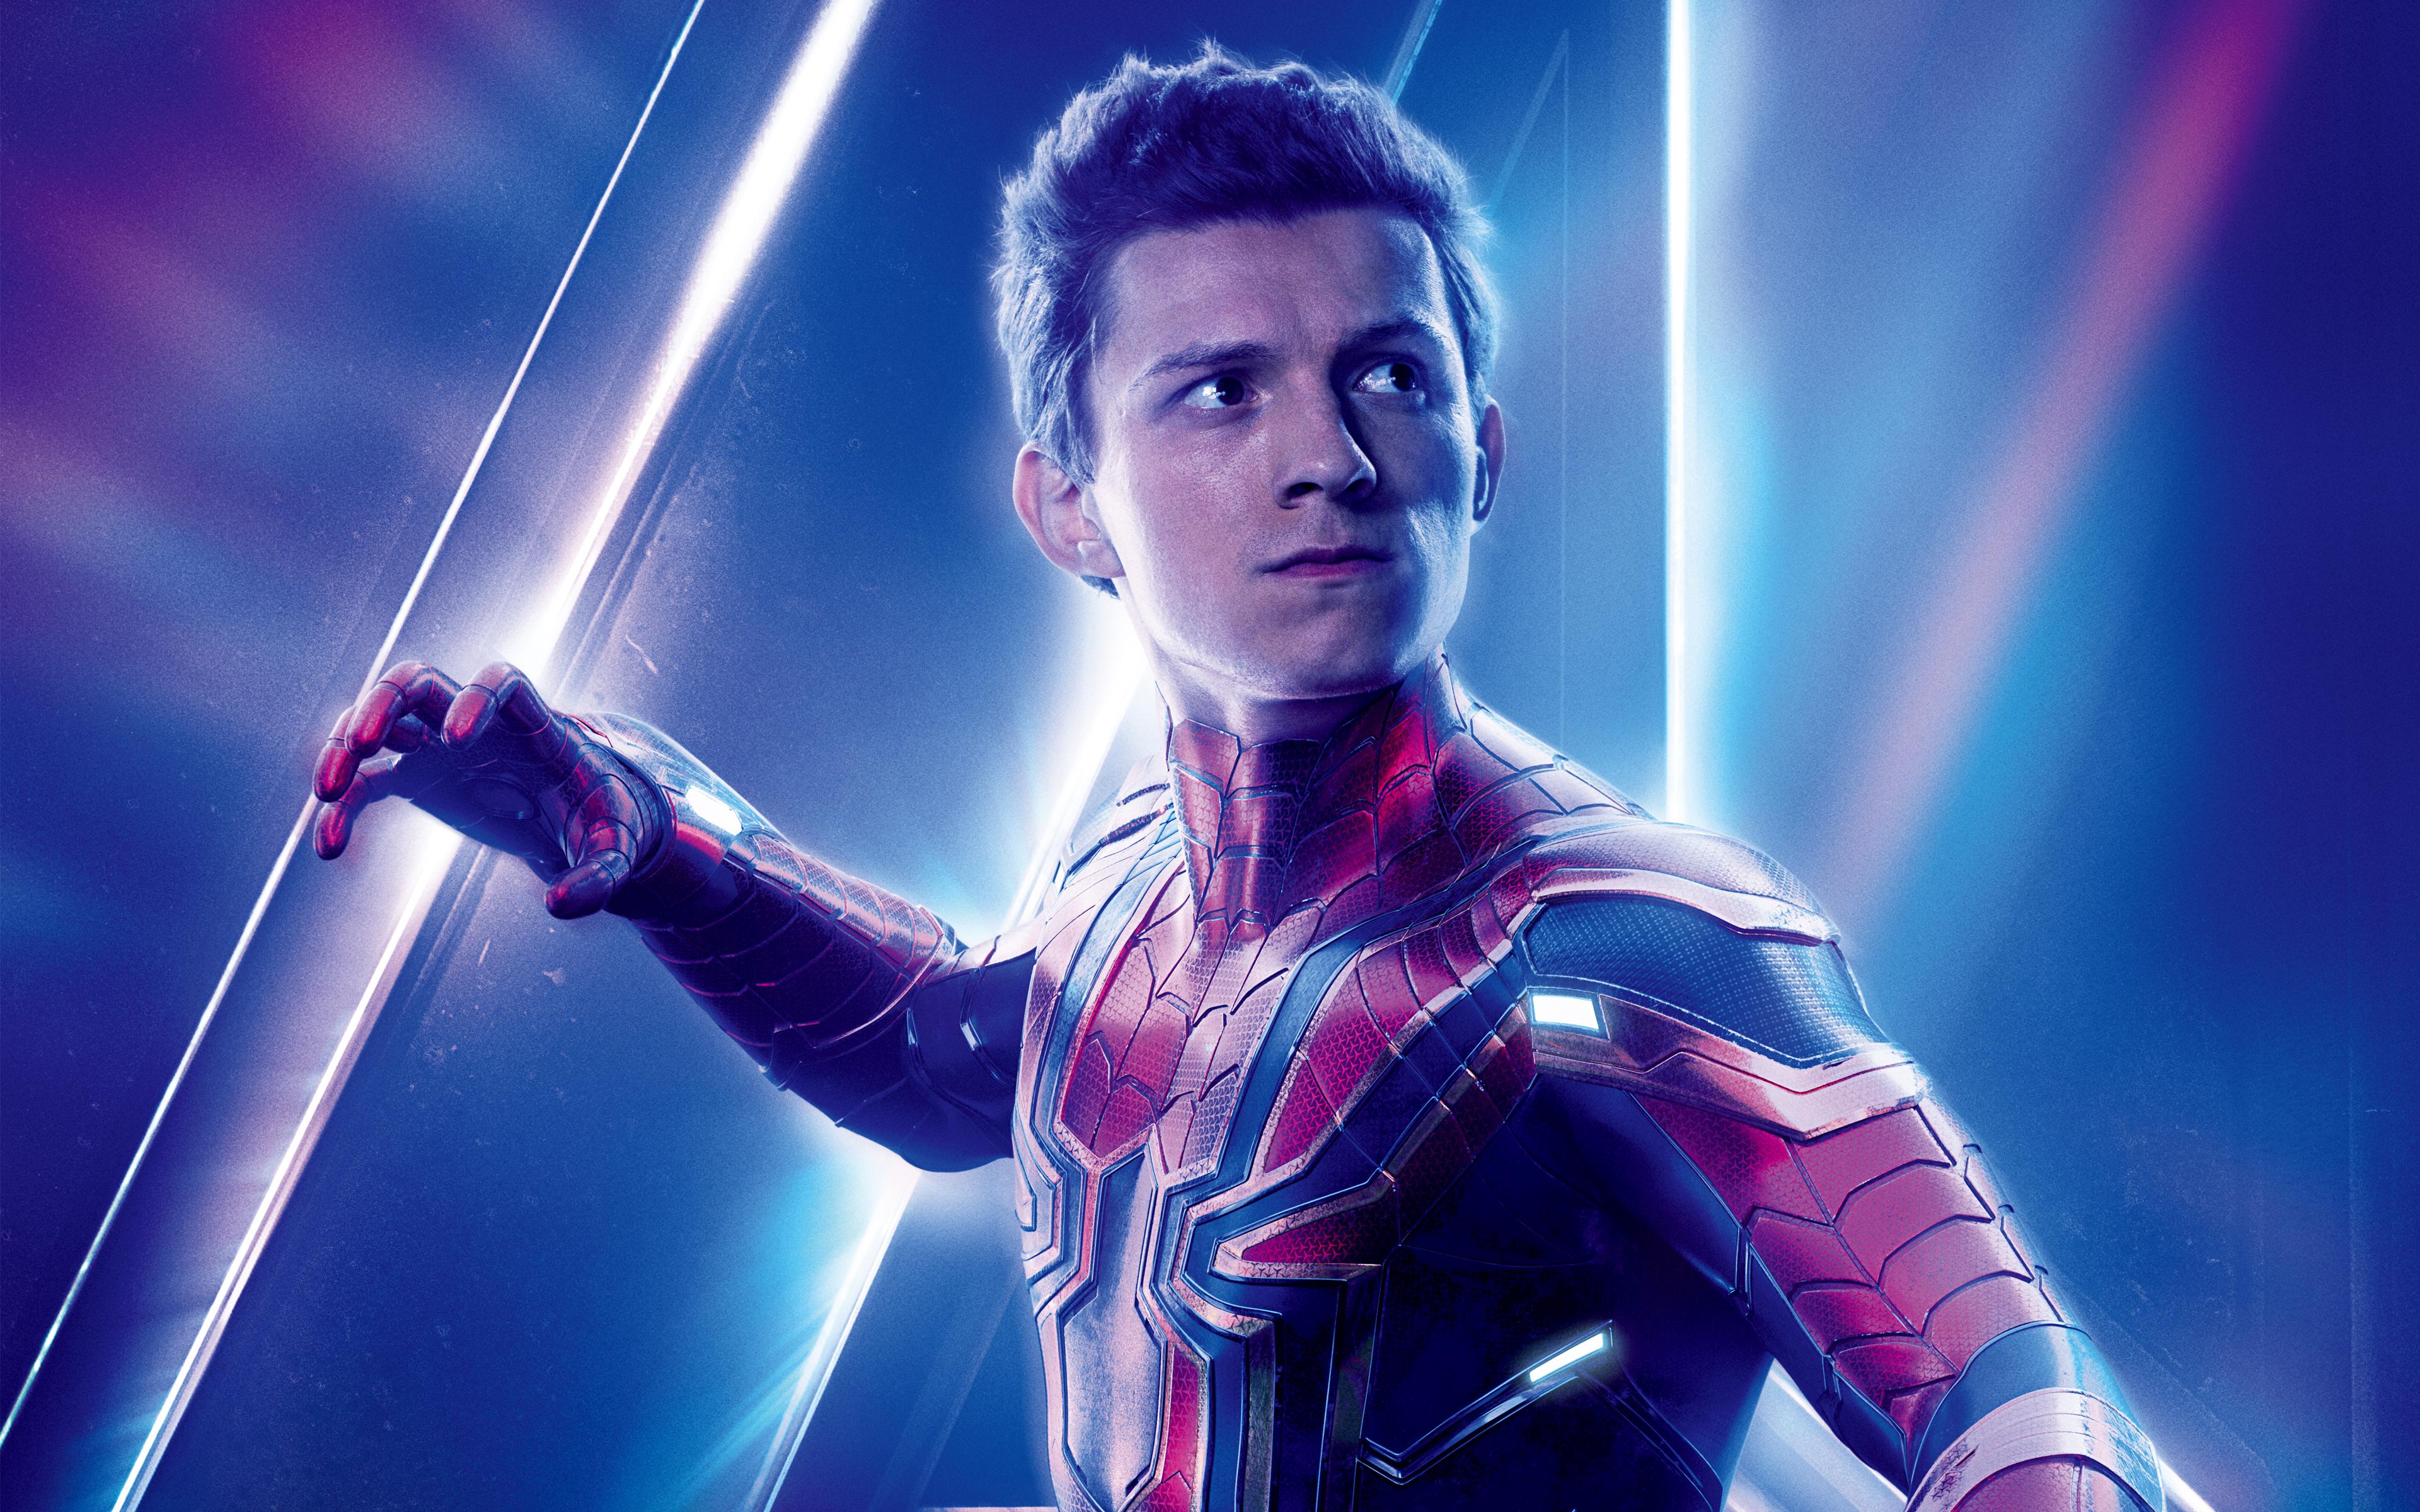 Wallpaper 4k Tom Holland As Spider Man Avengers Infinity War 4k 8k